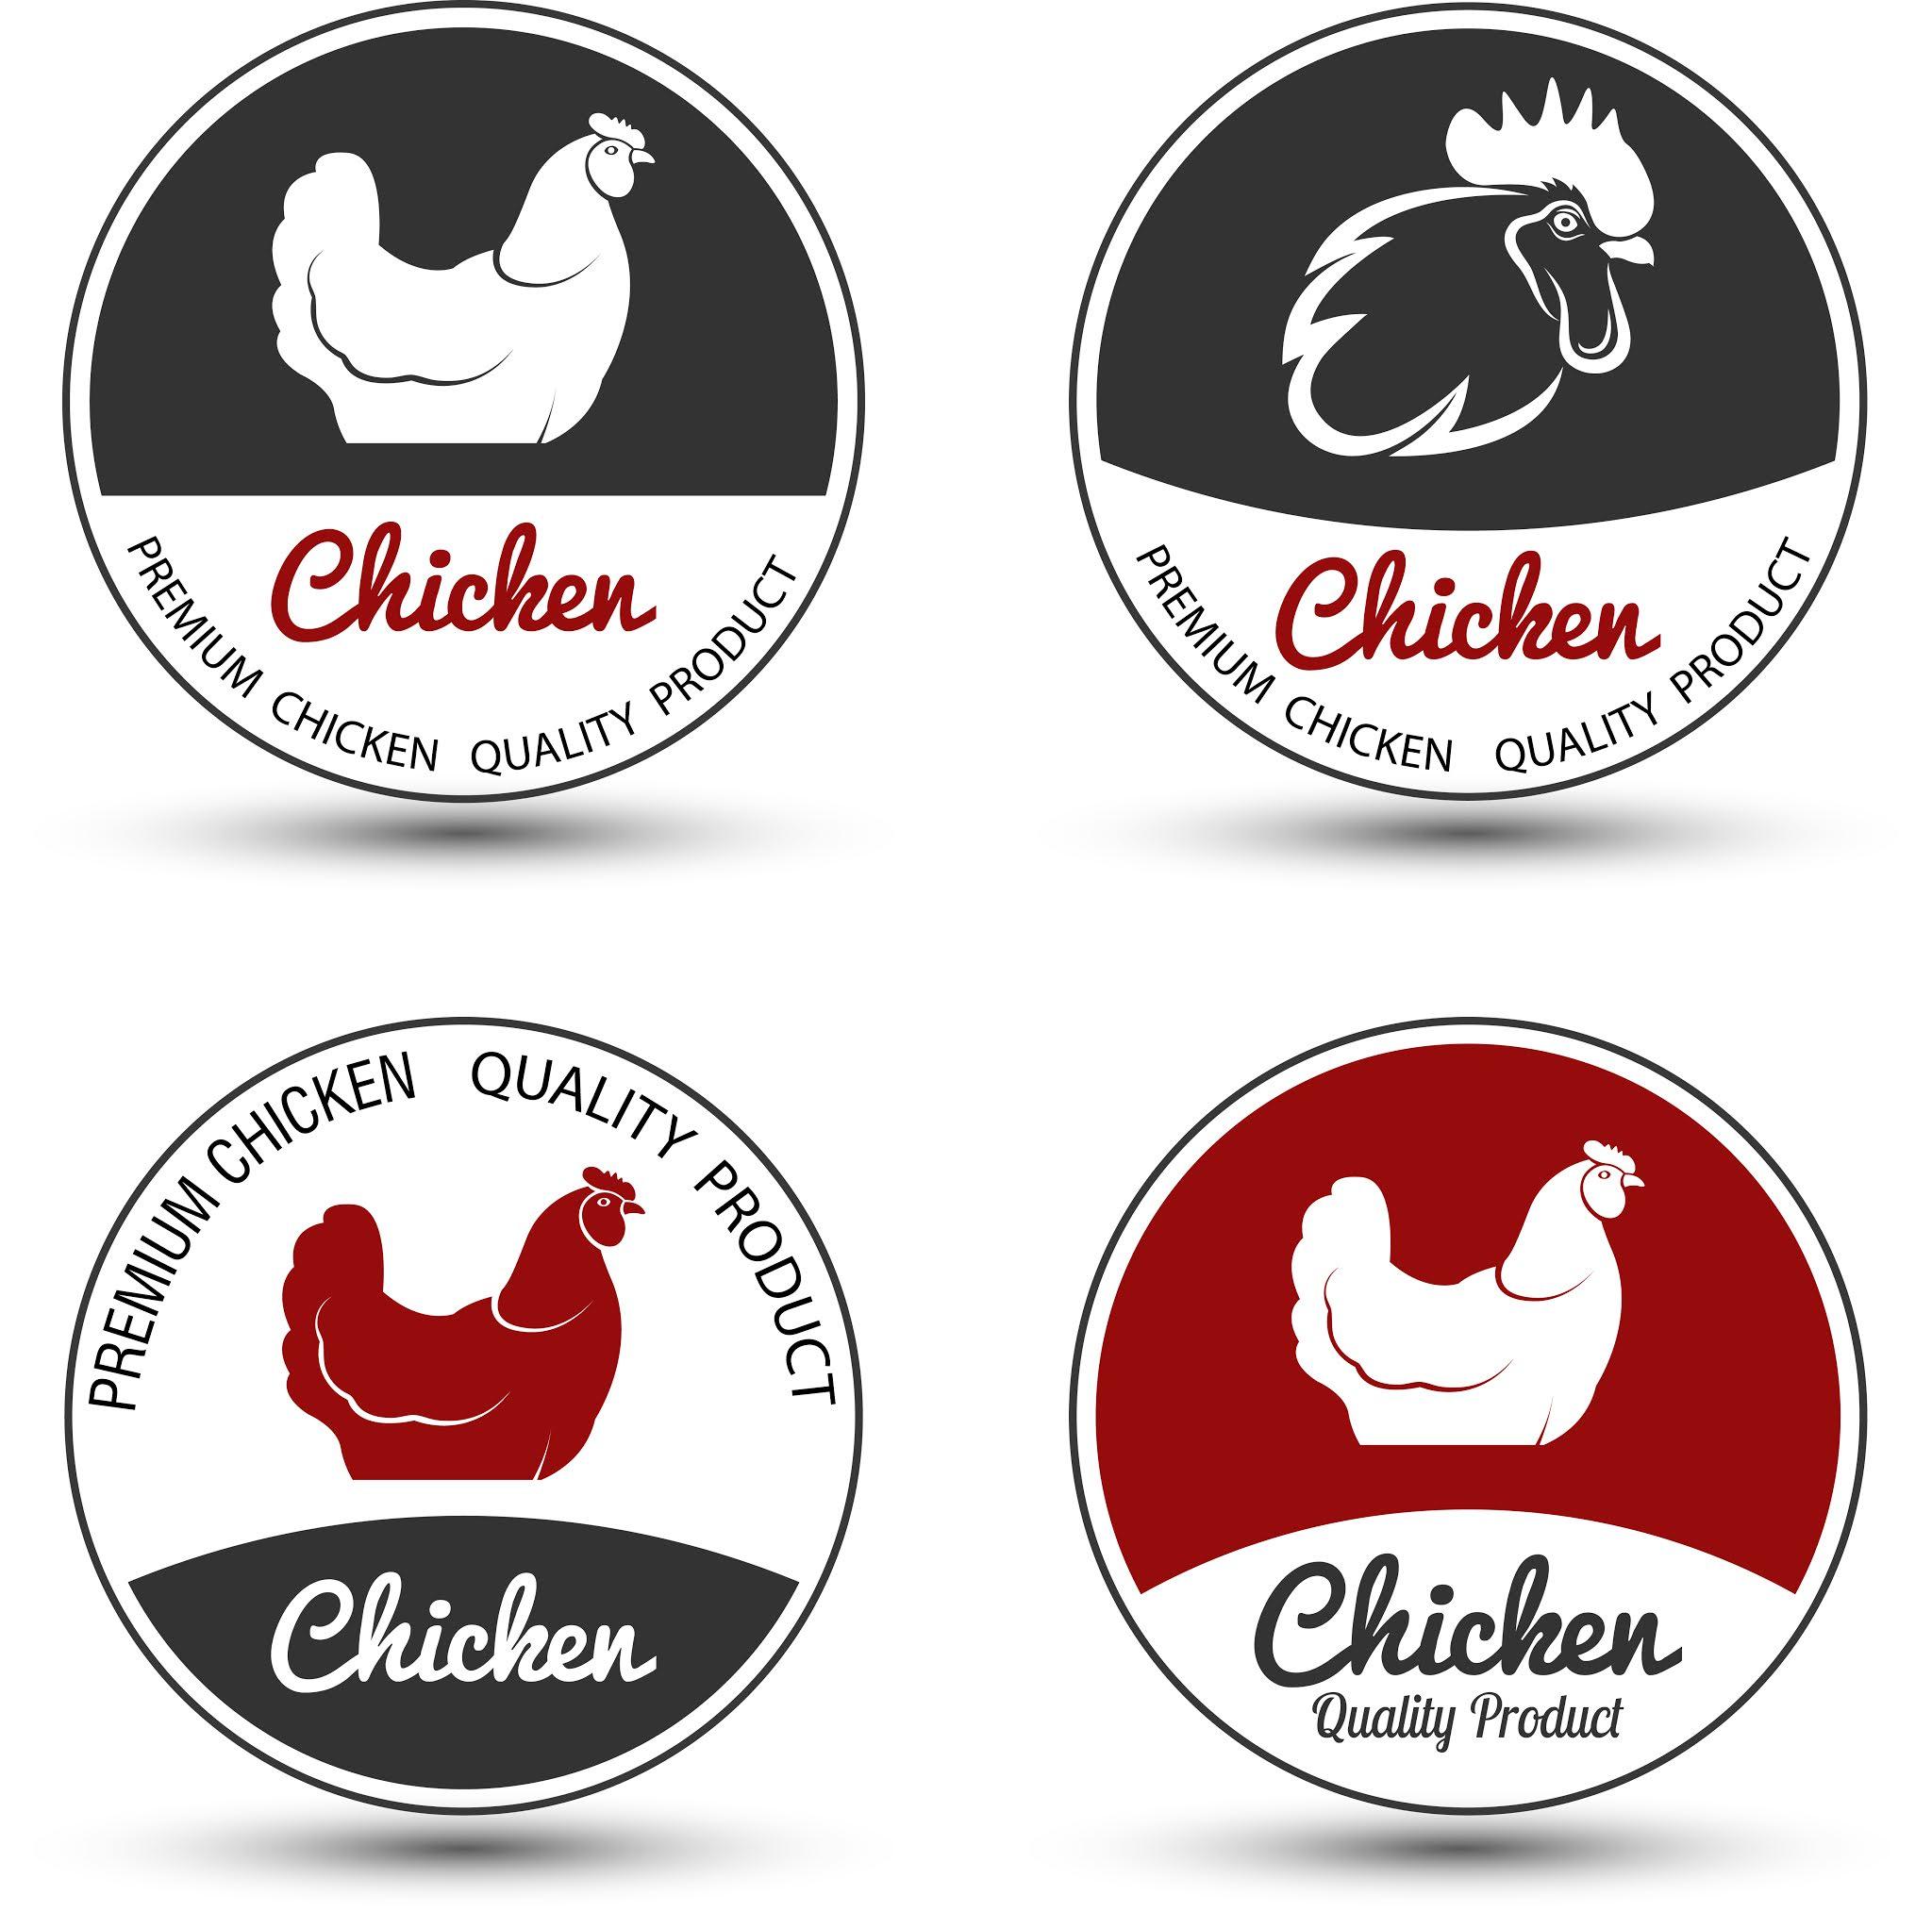 A set of high quality chicken logo designs